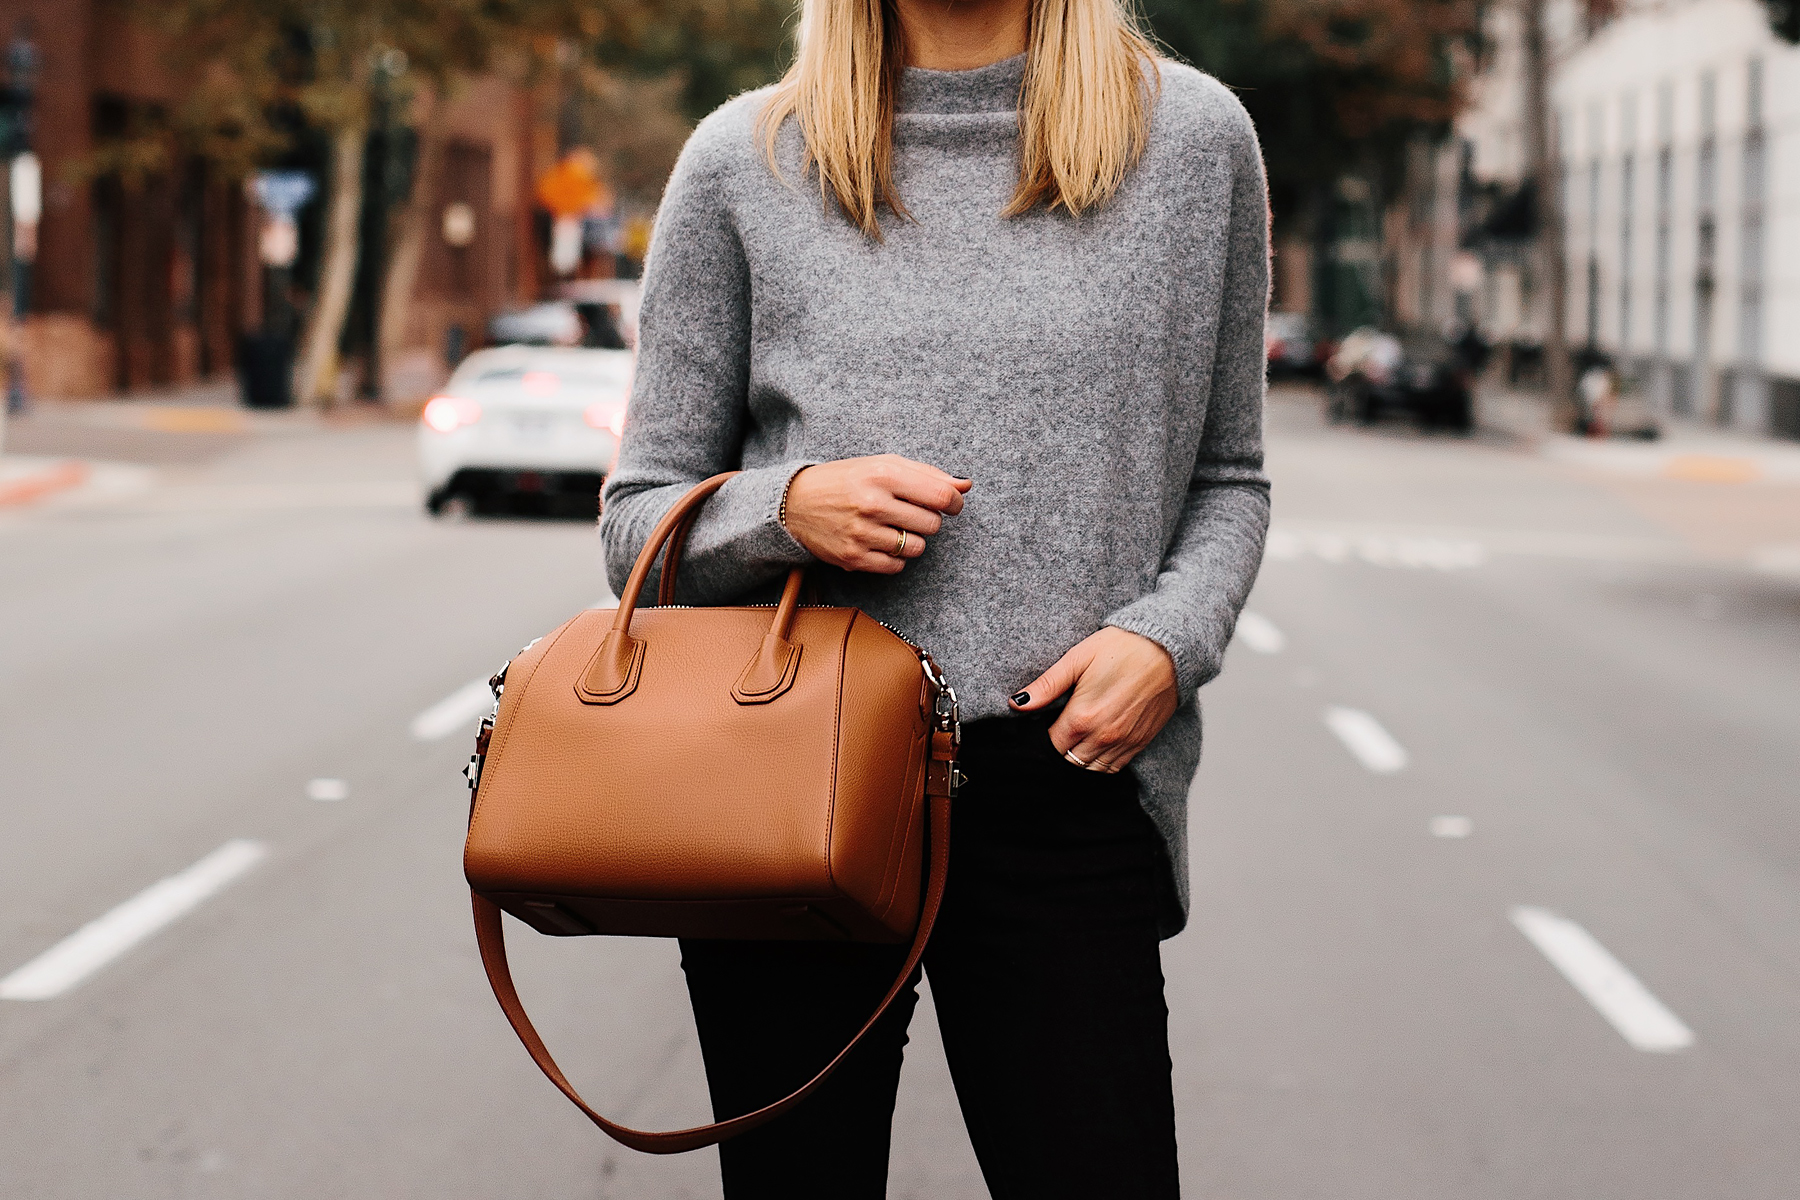 Fashion Jackson Bloomingdales Grey Cashmere Mock Neck Sweater Black Skinny Jeans Tan Satchel Handbag